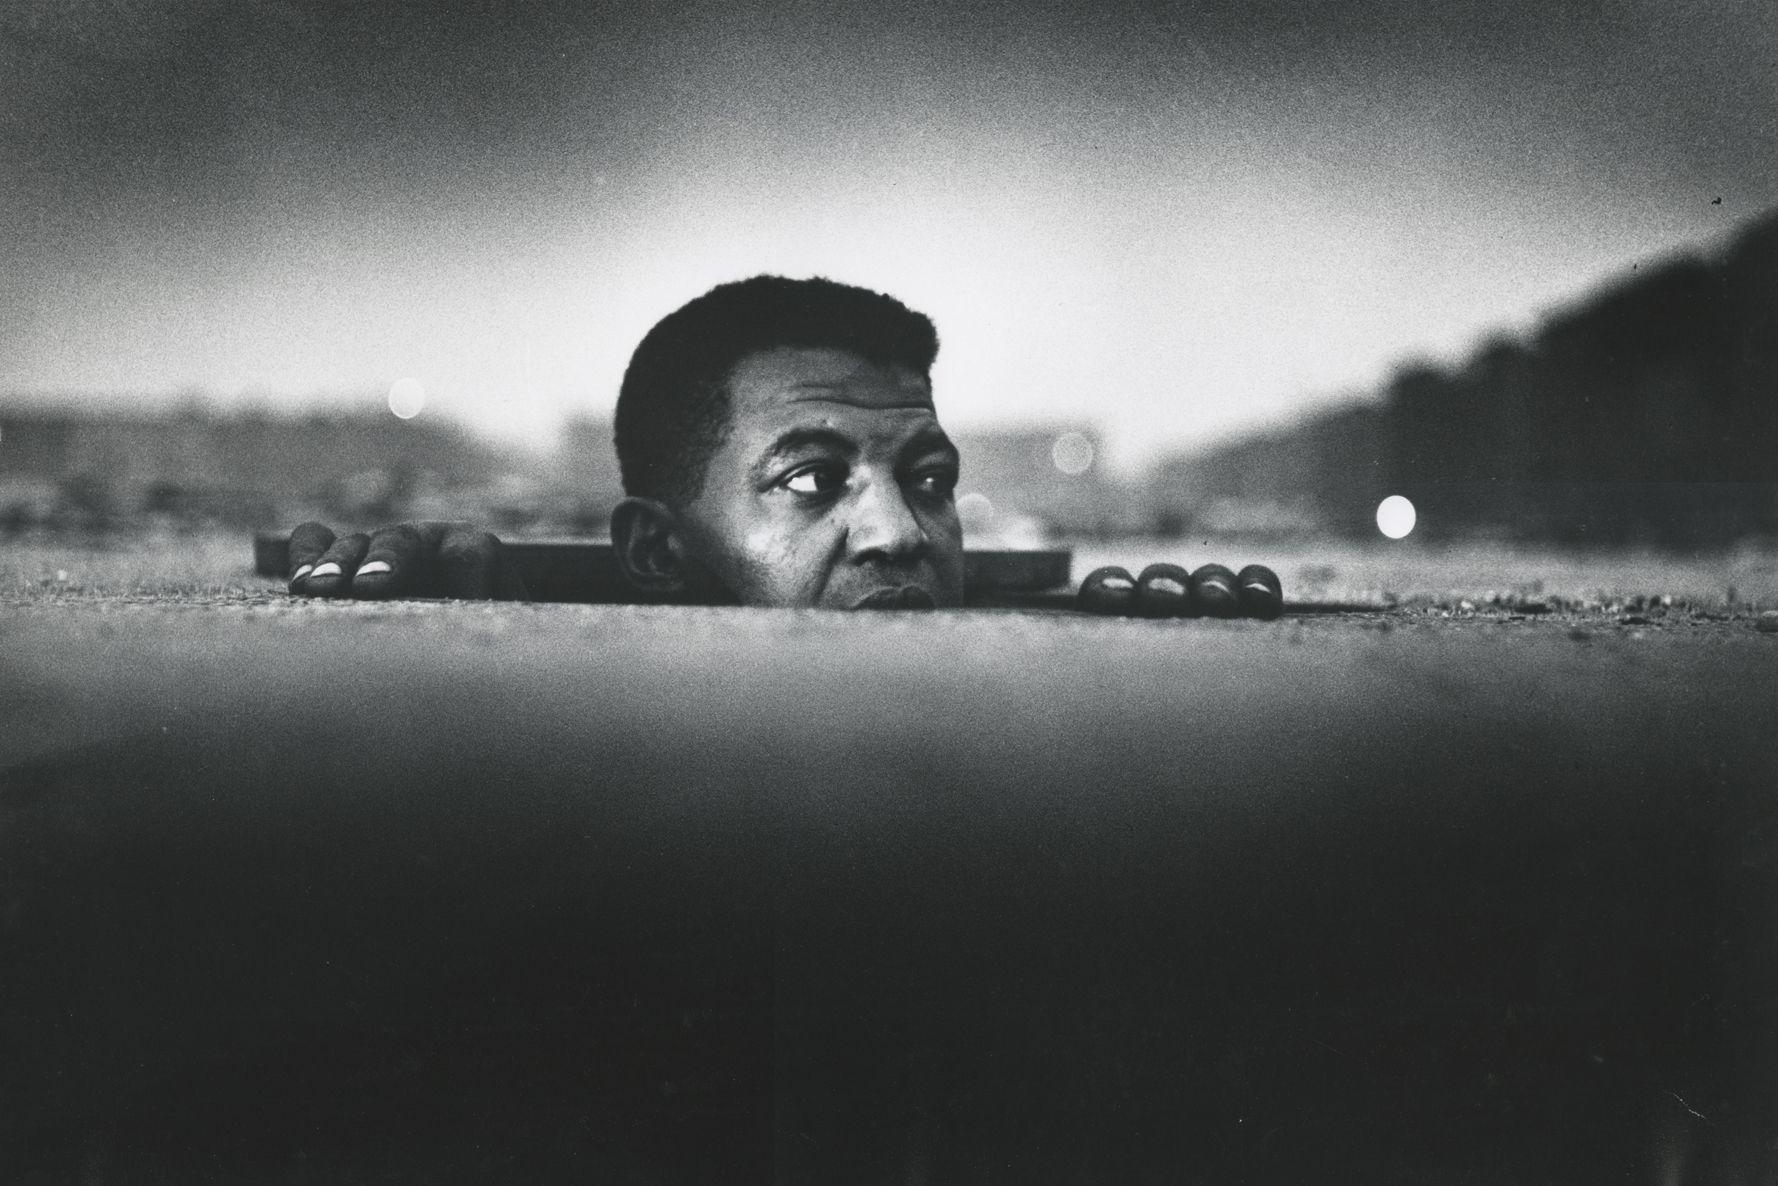 Gordon Parks - Man Emerging, Harlem, New York, 1952 - Howard Greenberg Gallery - 2019